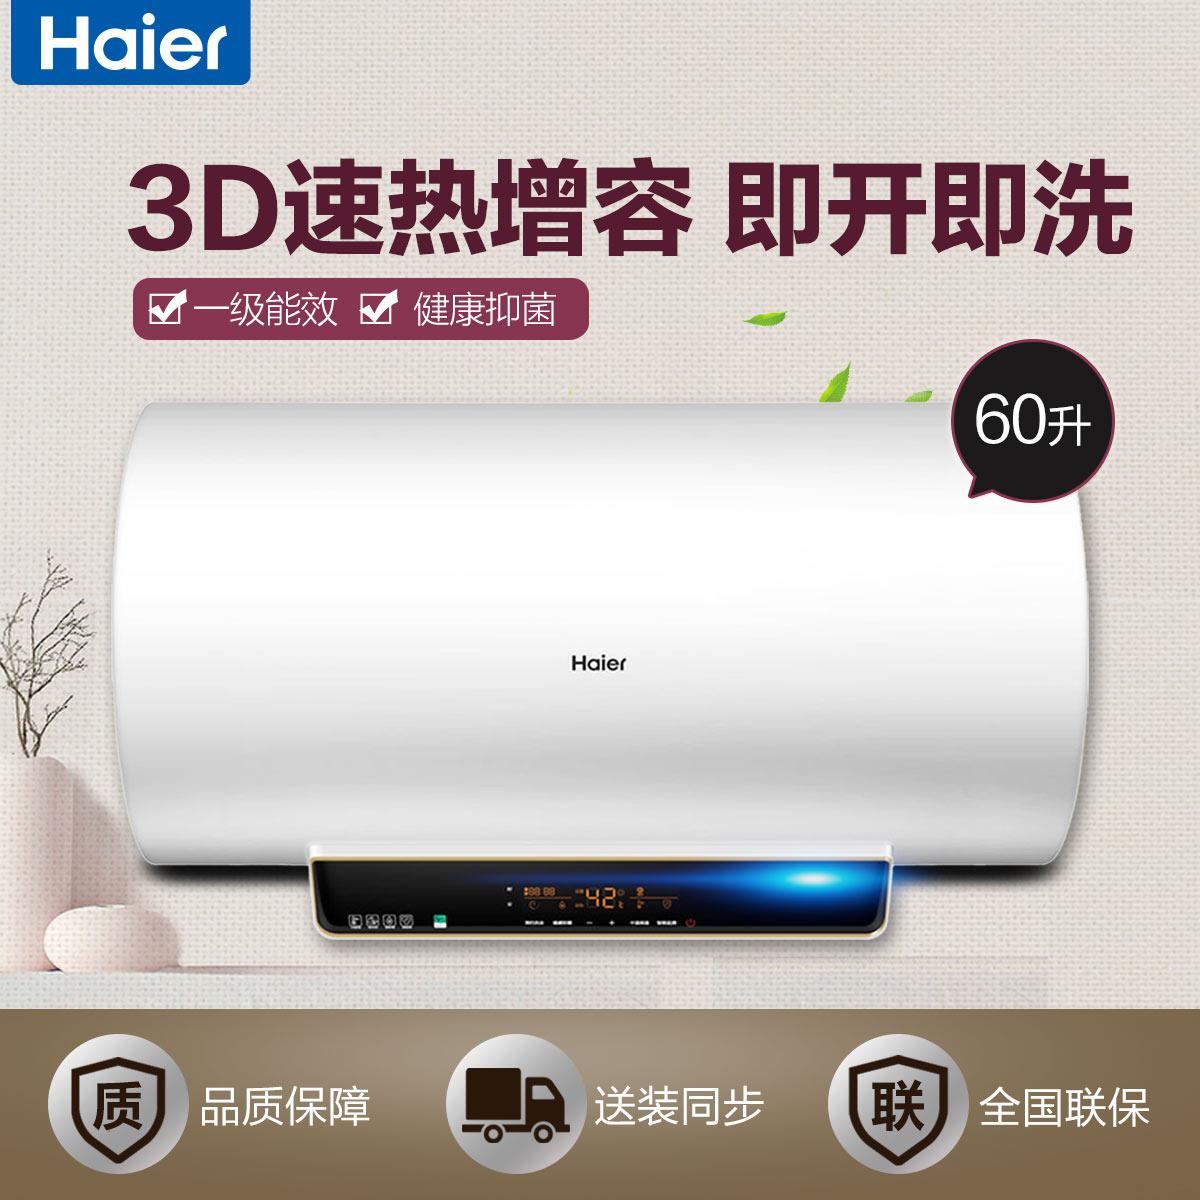 Haier/海尔 电热水器 EC6005-T+